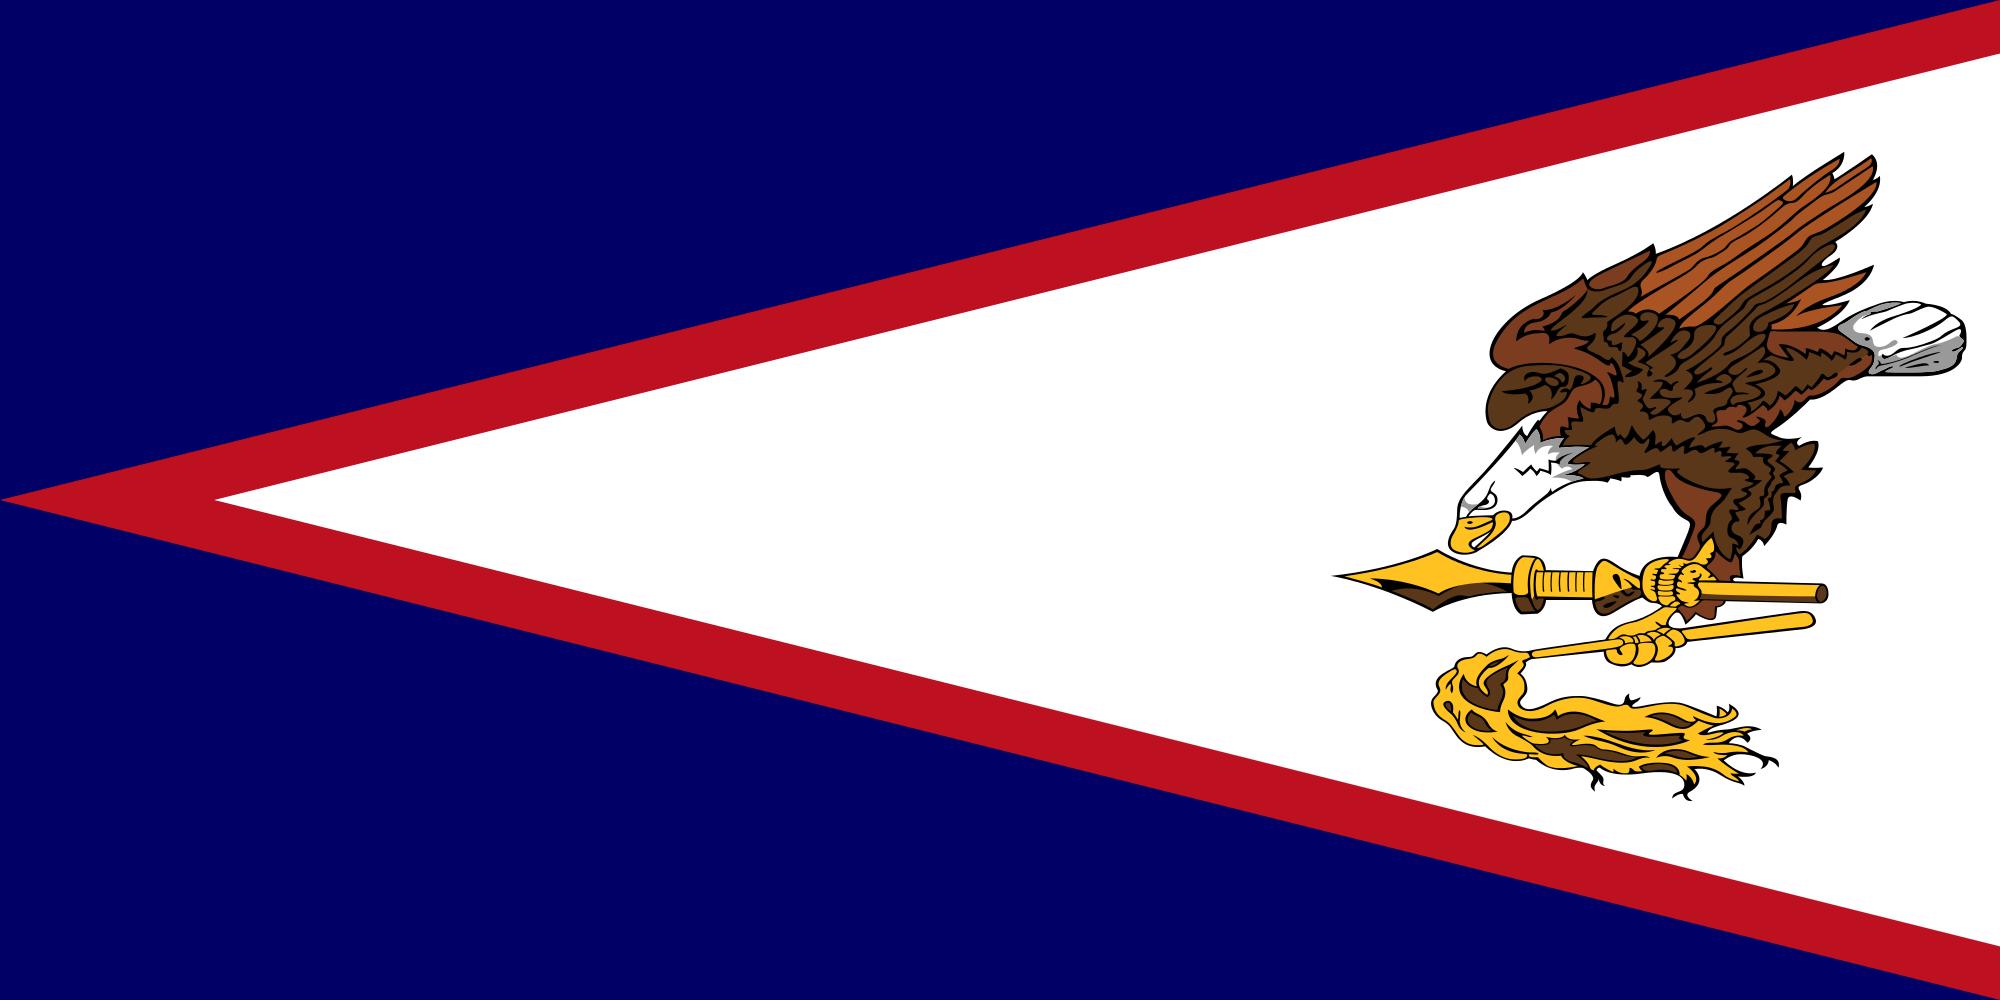 samoa americana, país, emblema, insignia, символ - Обои HD - Профессор falken.com